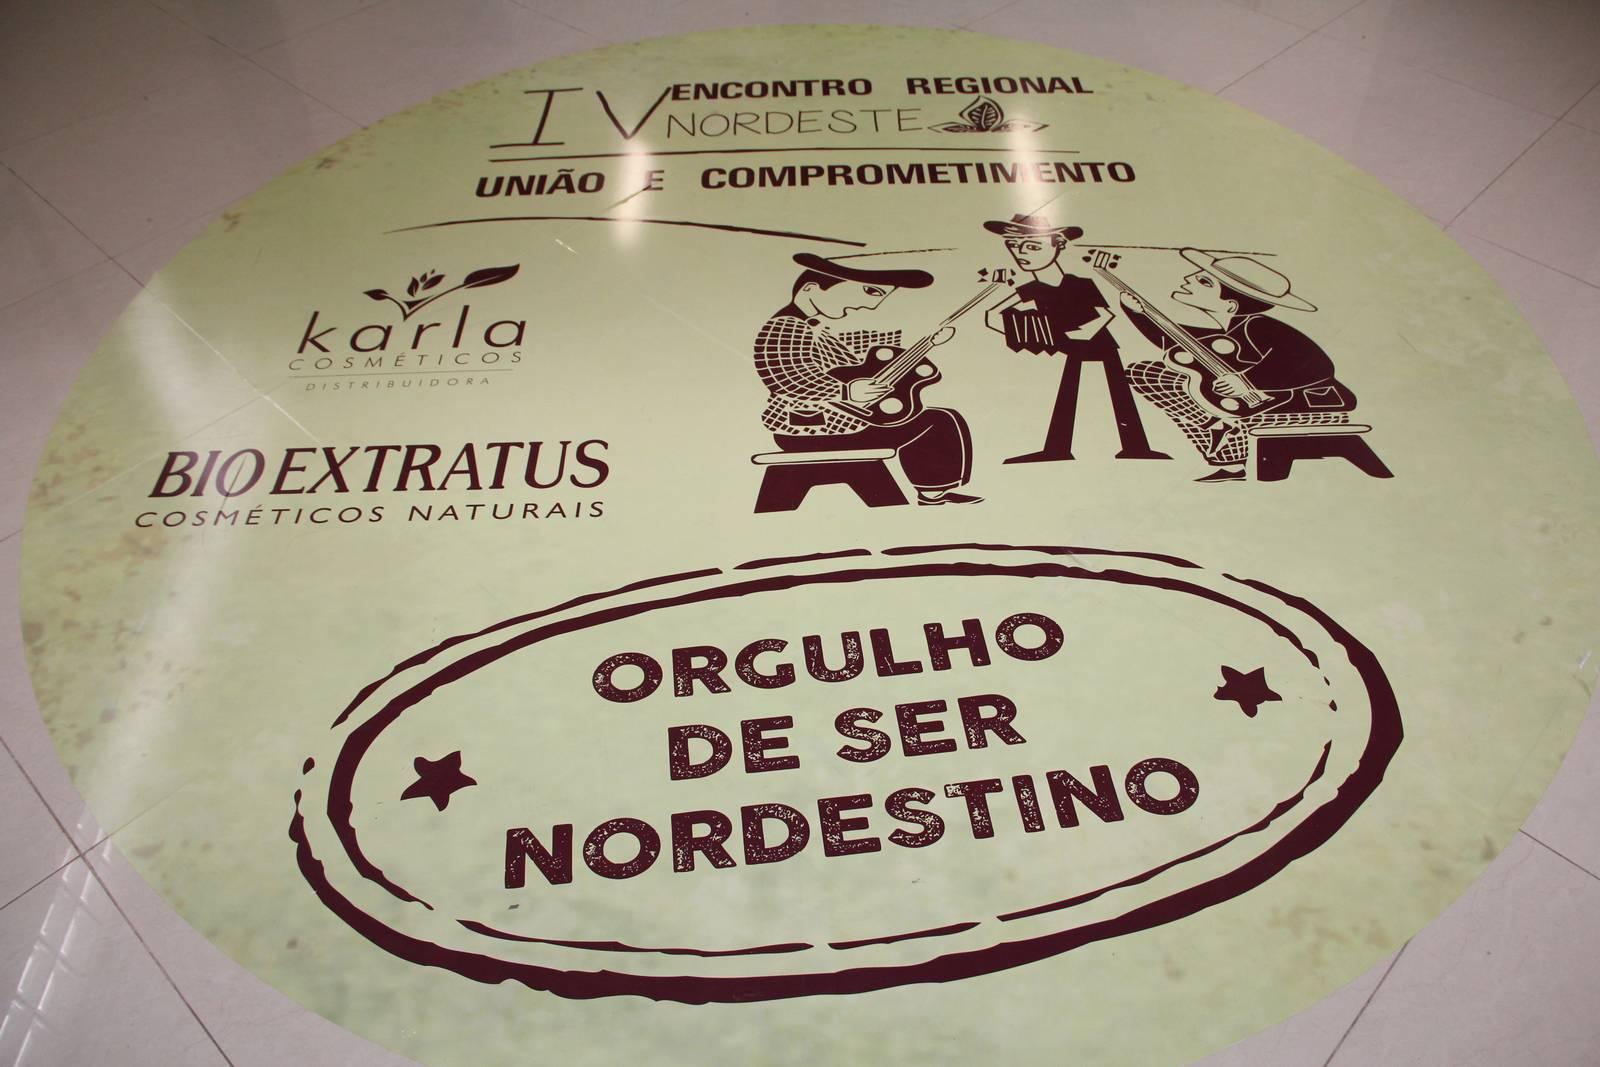 IV Encontro Regional do Nordeste - Bio Extratus (34)